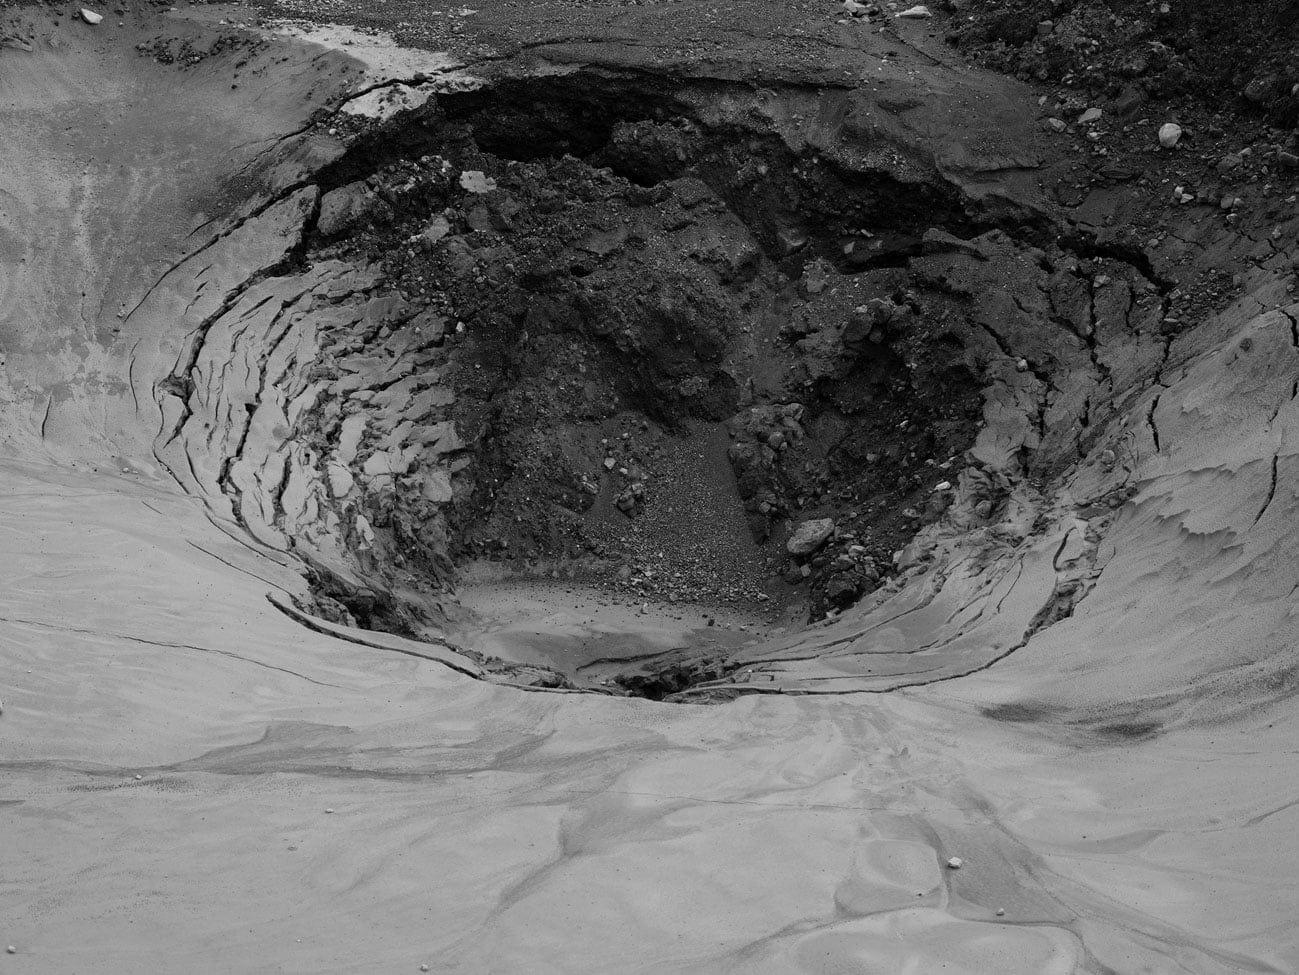 glacier_020_31.5x42